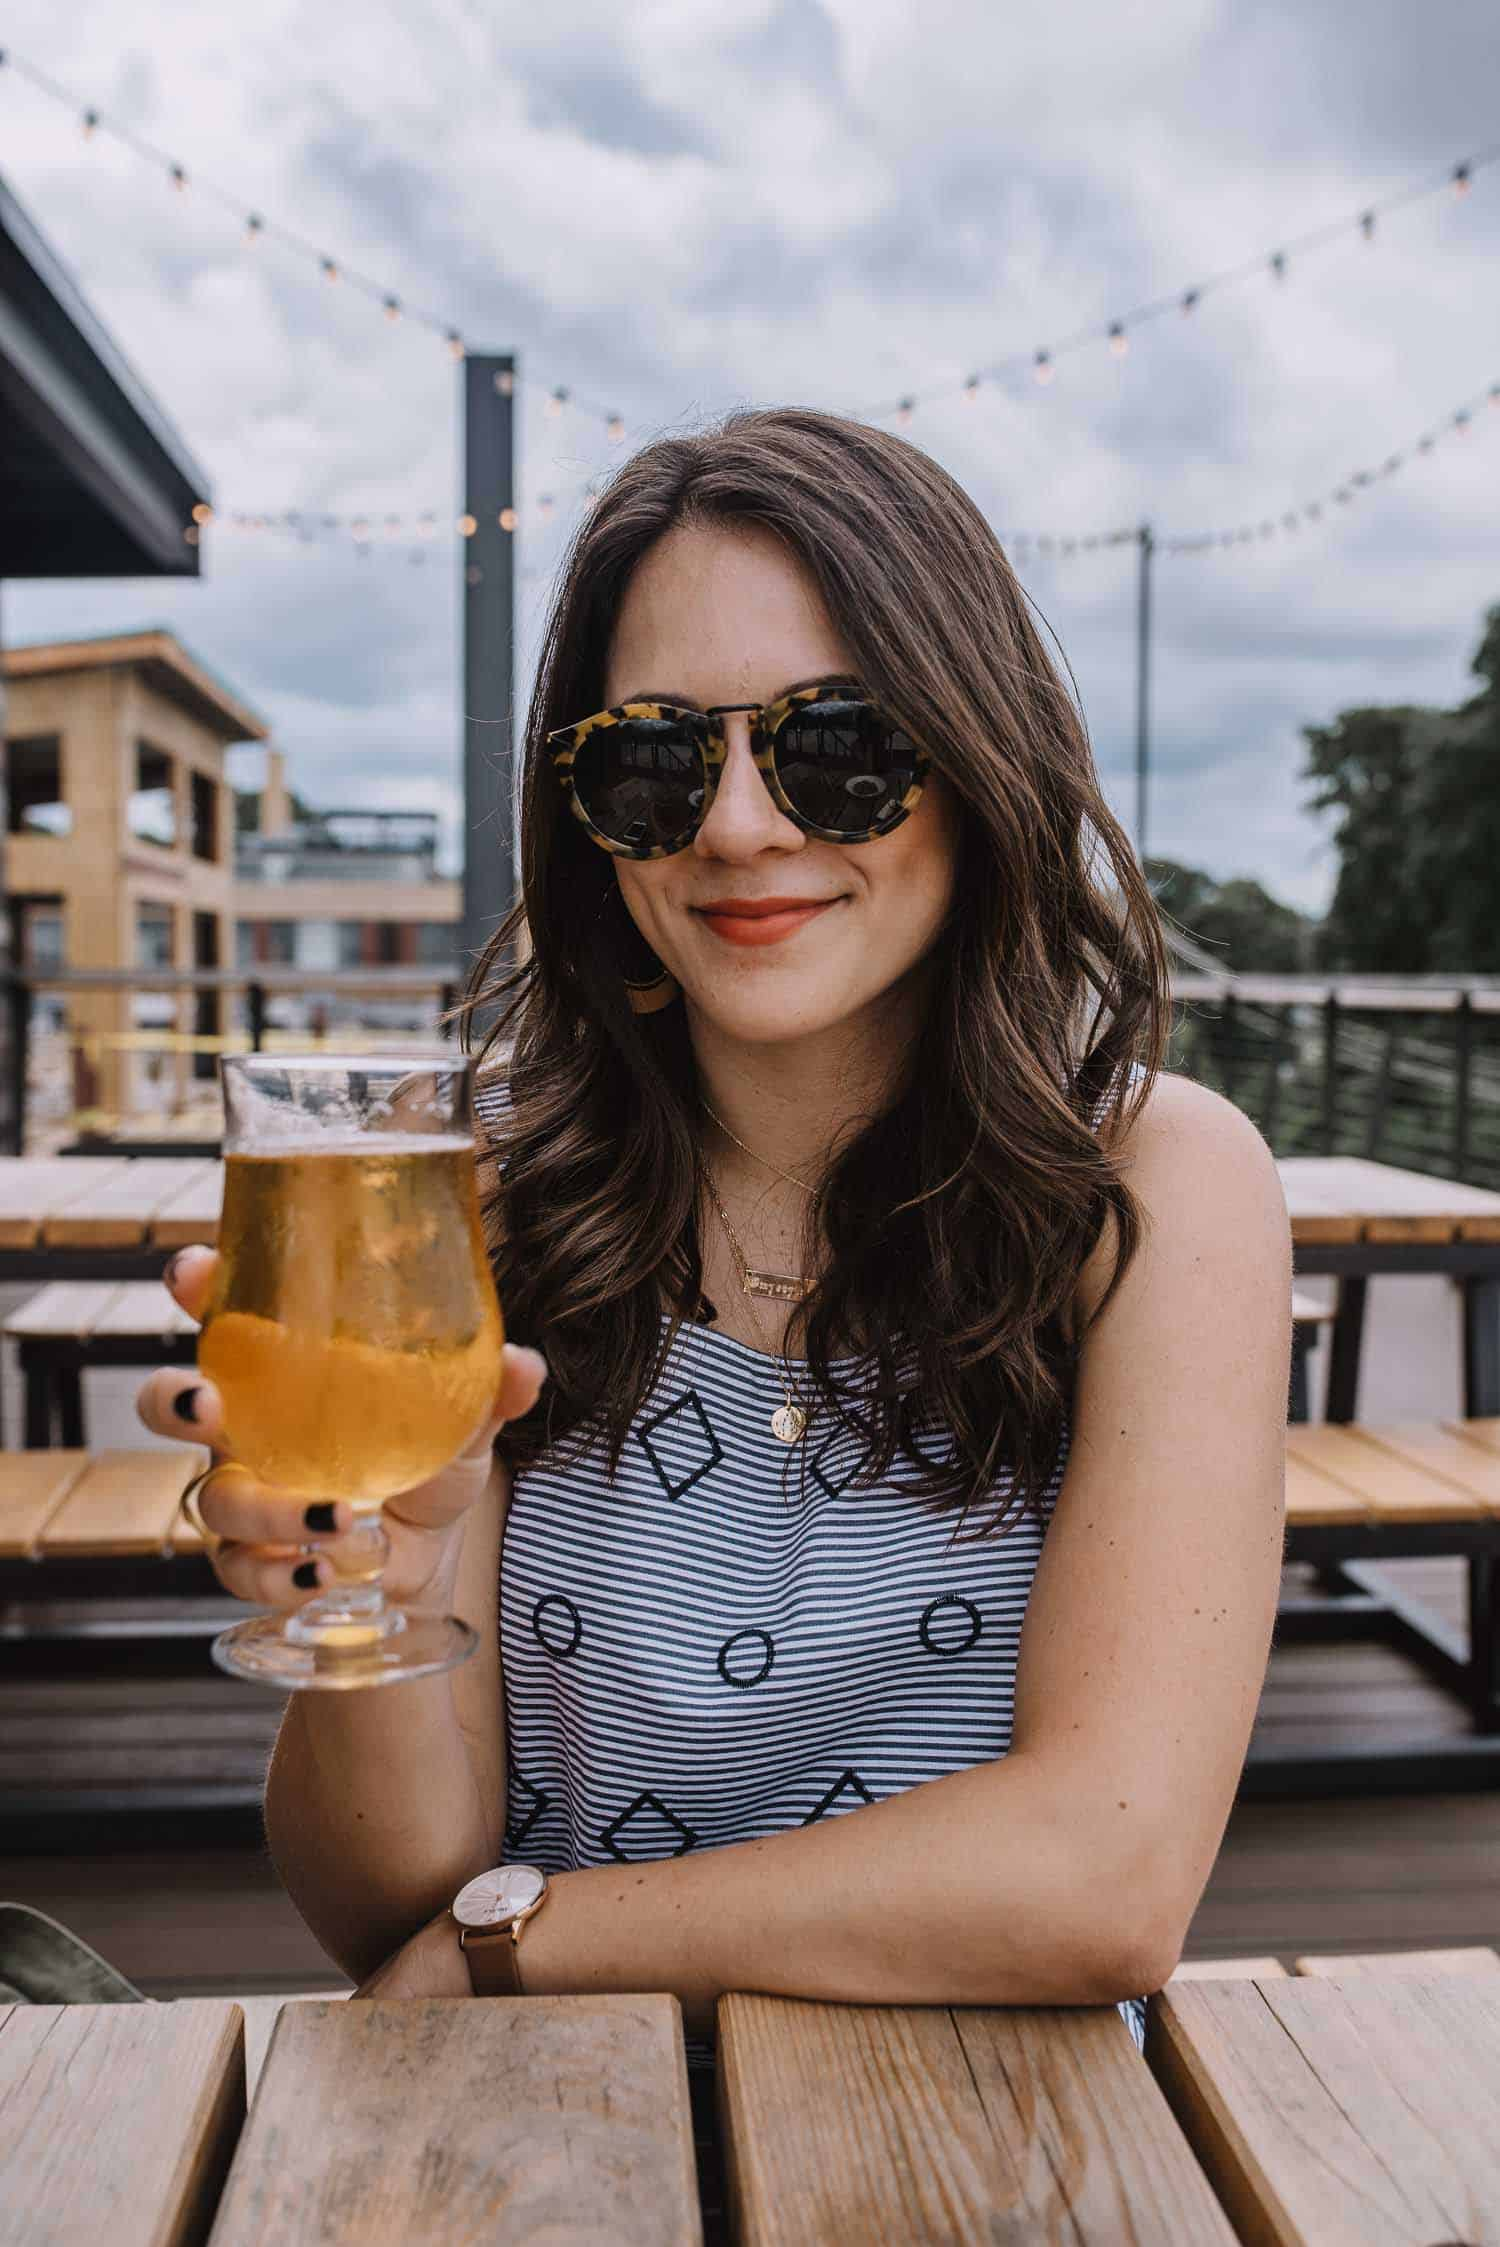 Best Atlanta Brewery, where to spend your weekend in Atlanta - My Style Vita